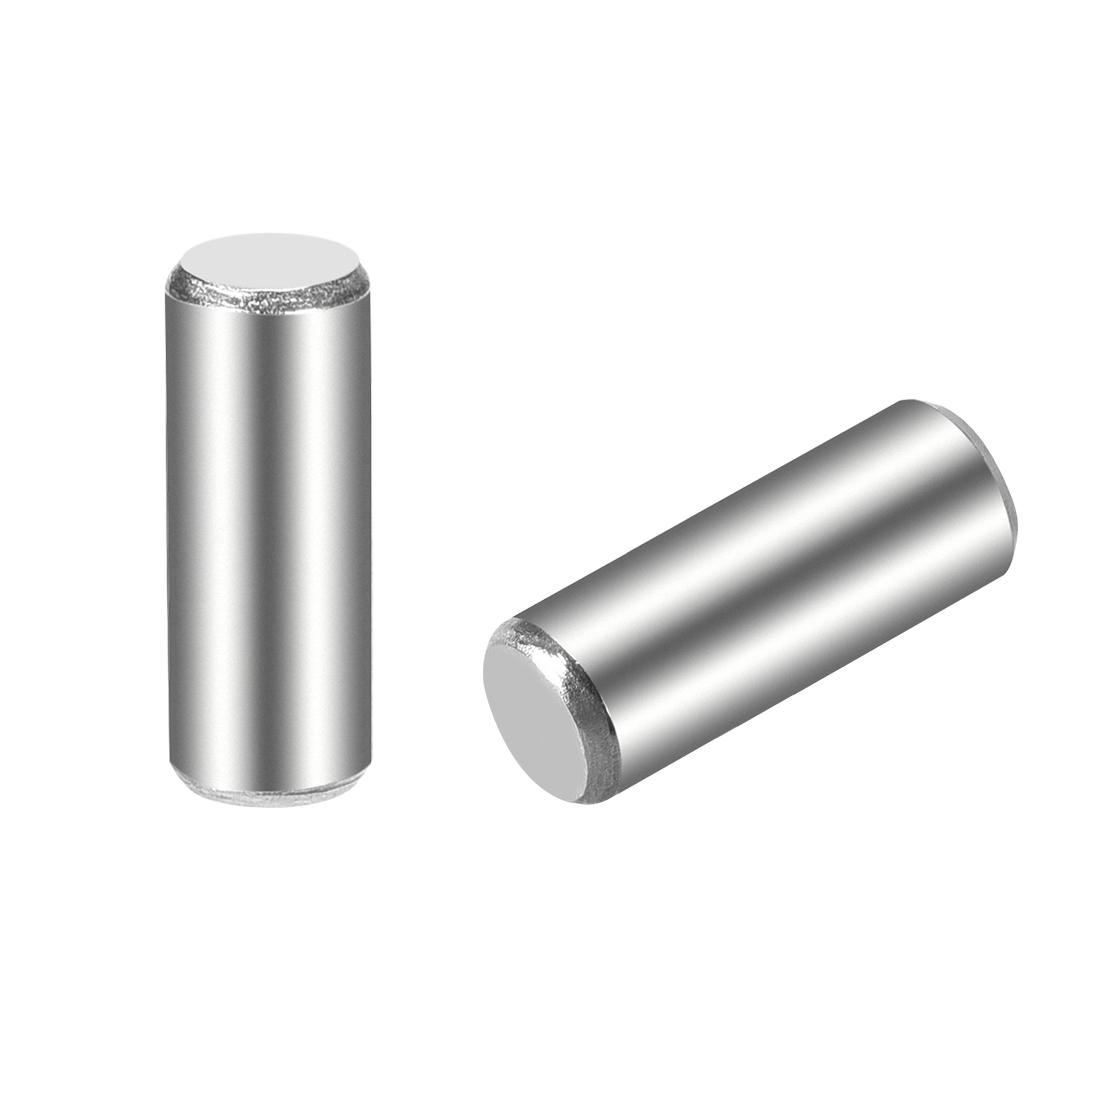 25Pcs 5mm x 14mm Dowel Pin 304 Stainless Steel Shelf Support Pin Fasten